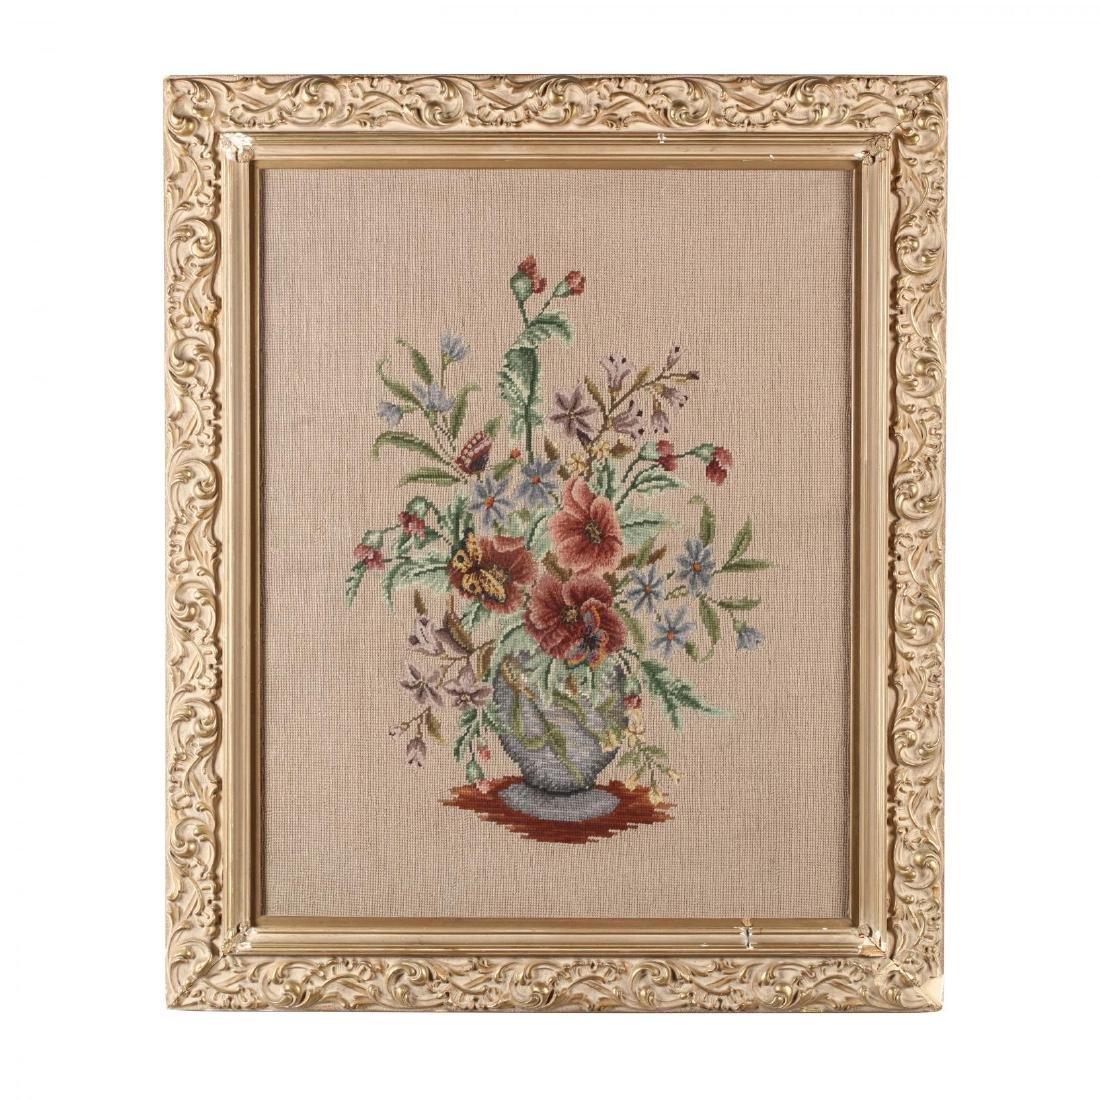 A Vintage Needlework Still Life of Flowers